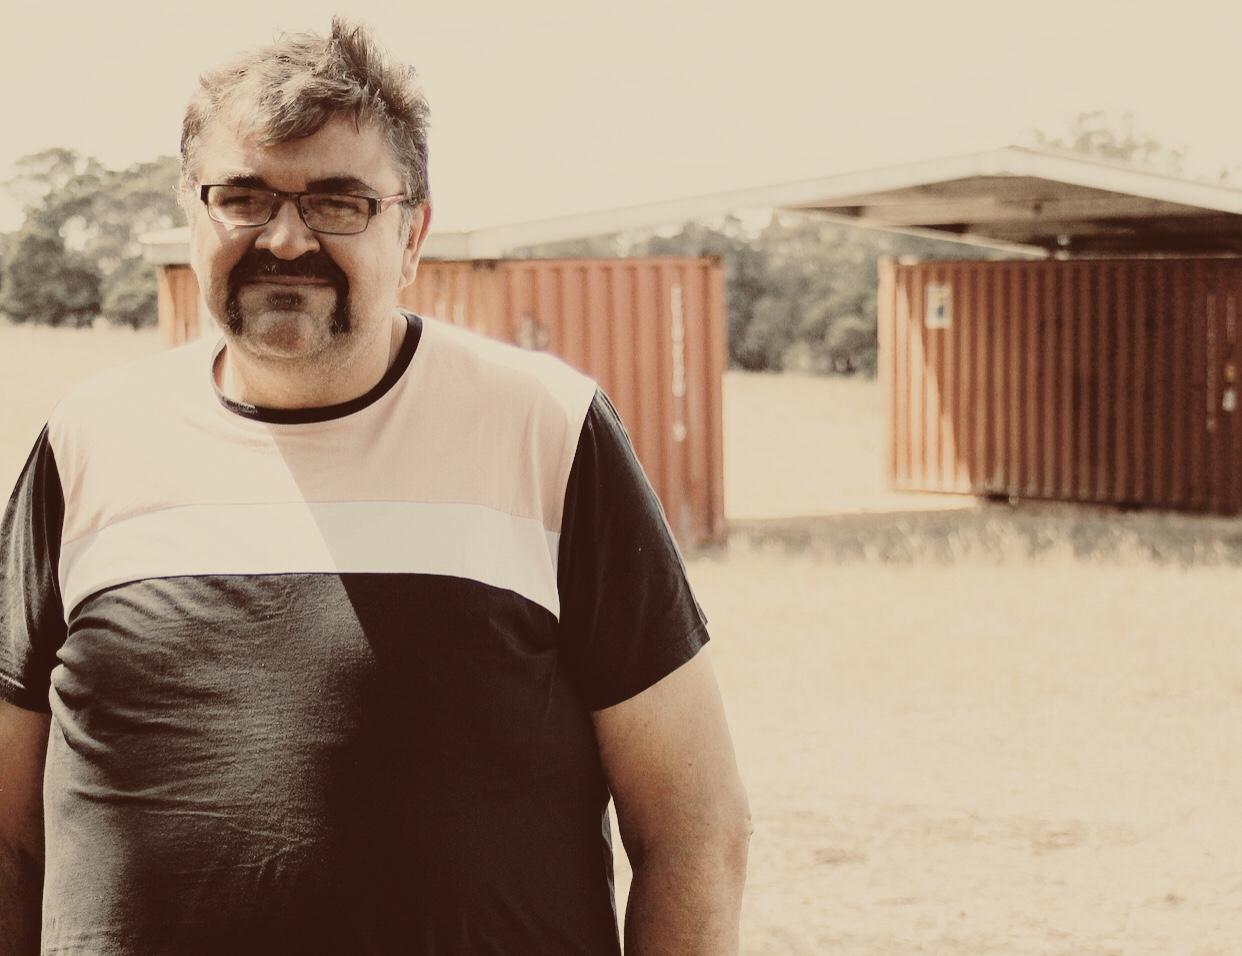 Damein Bell CEO of Gunditj Mirring Traditional Owner Aboriginal Corporation.